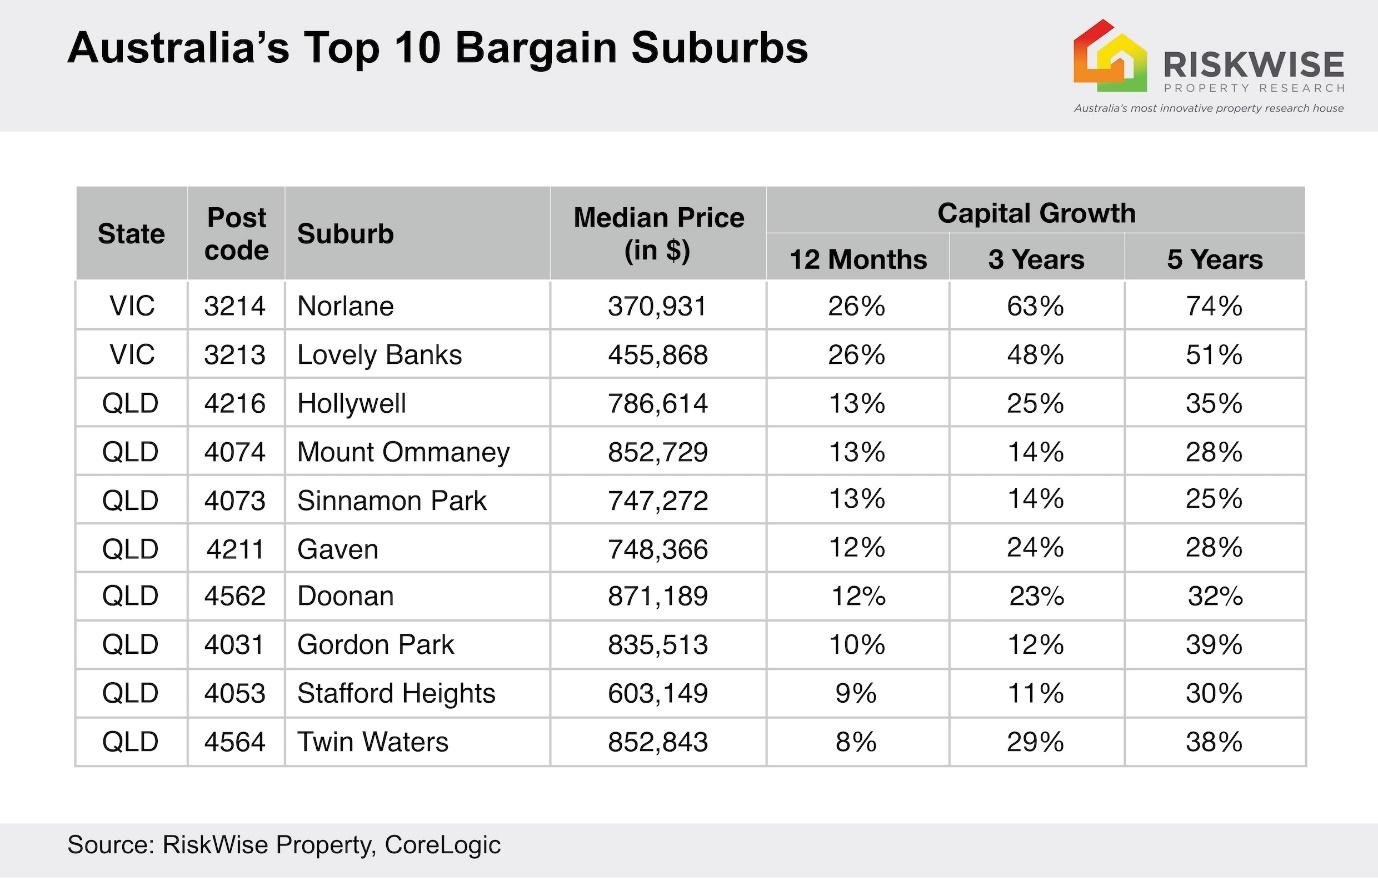 Australia's top 10 bargain suburbs